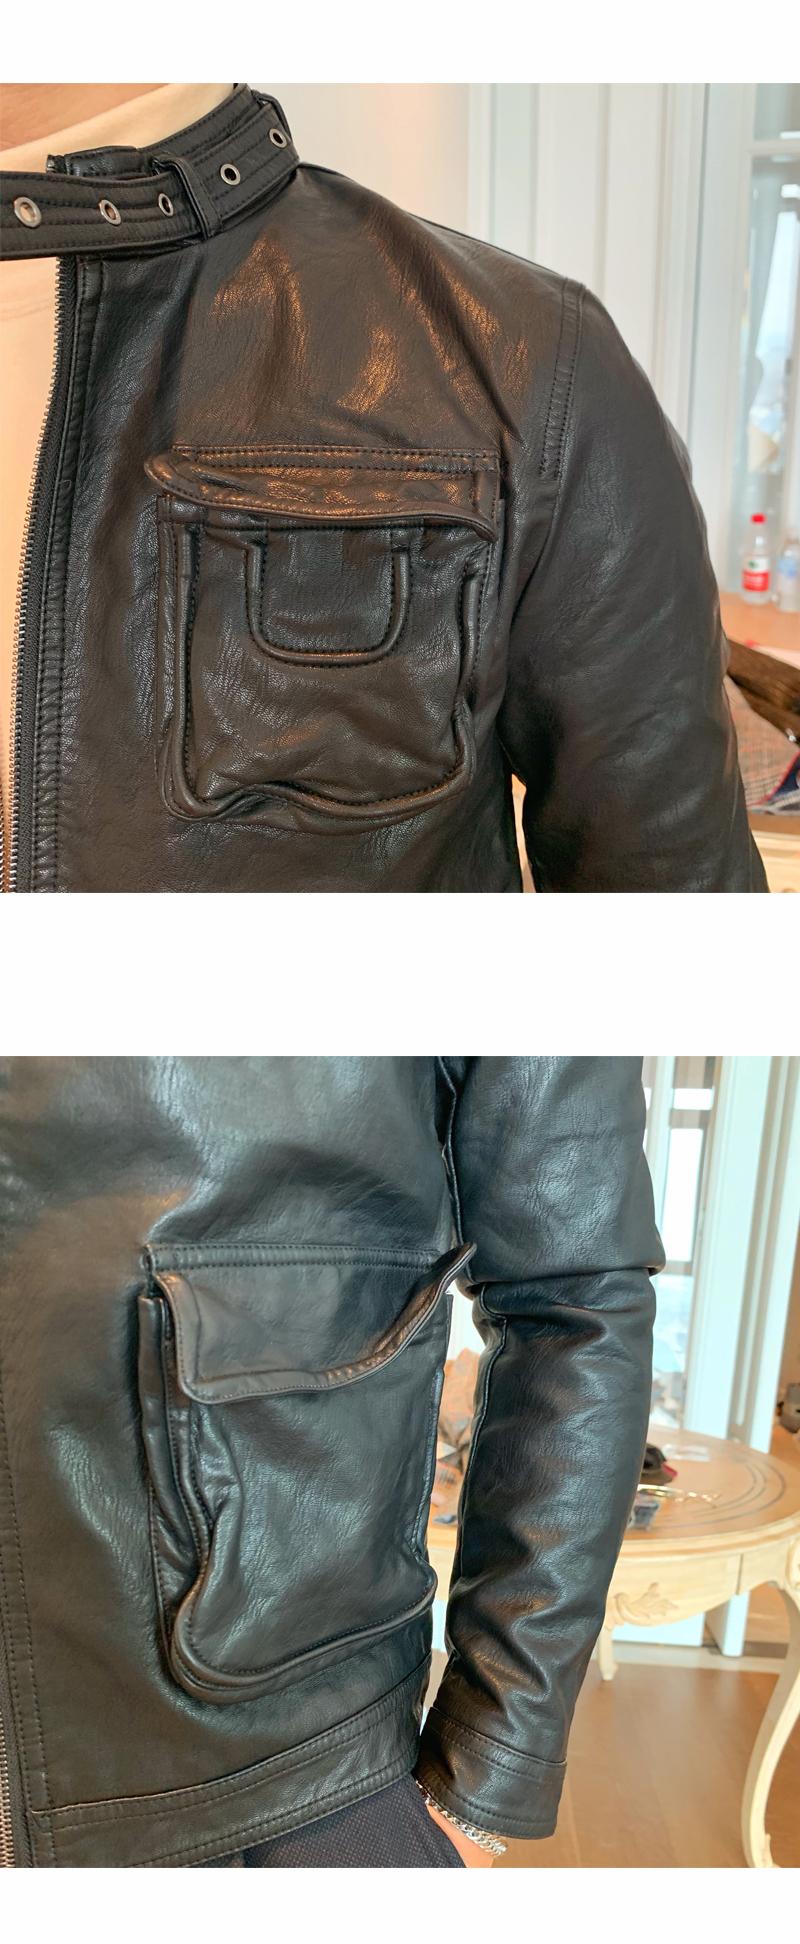 South Korea Korean version handsome collar leather jacket men's retro personality PU leather clothing fashion 100 locomotive leather fashion tide 47 Online shopping Bangladesh